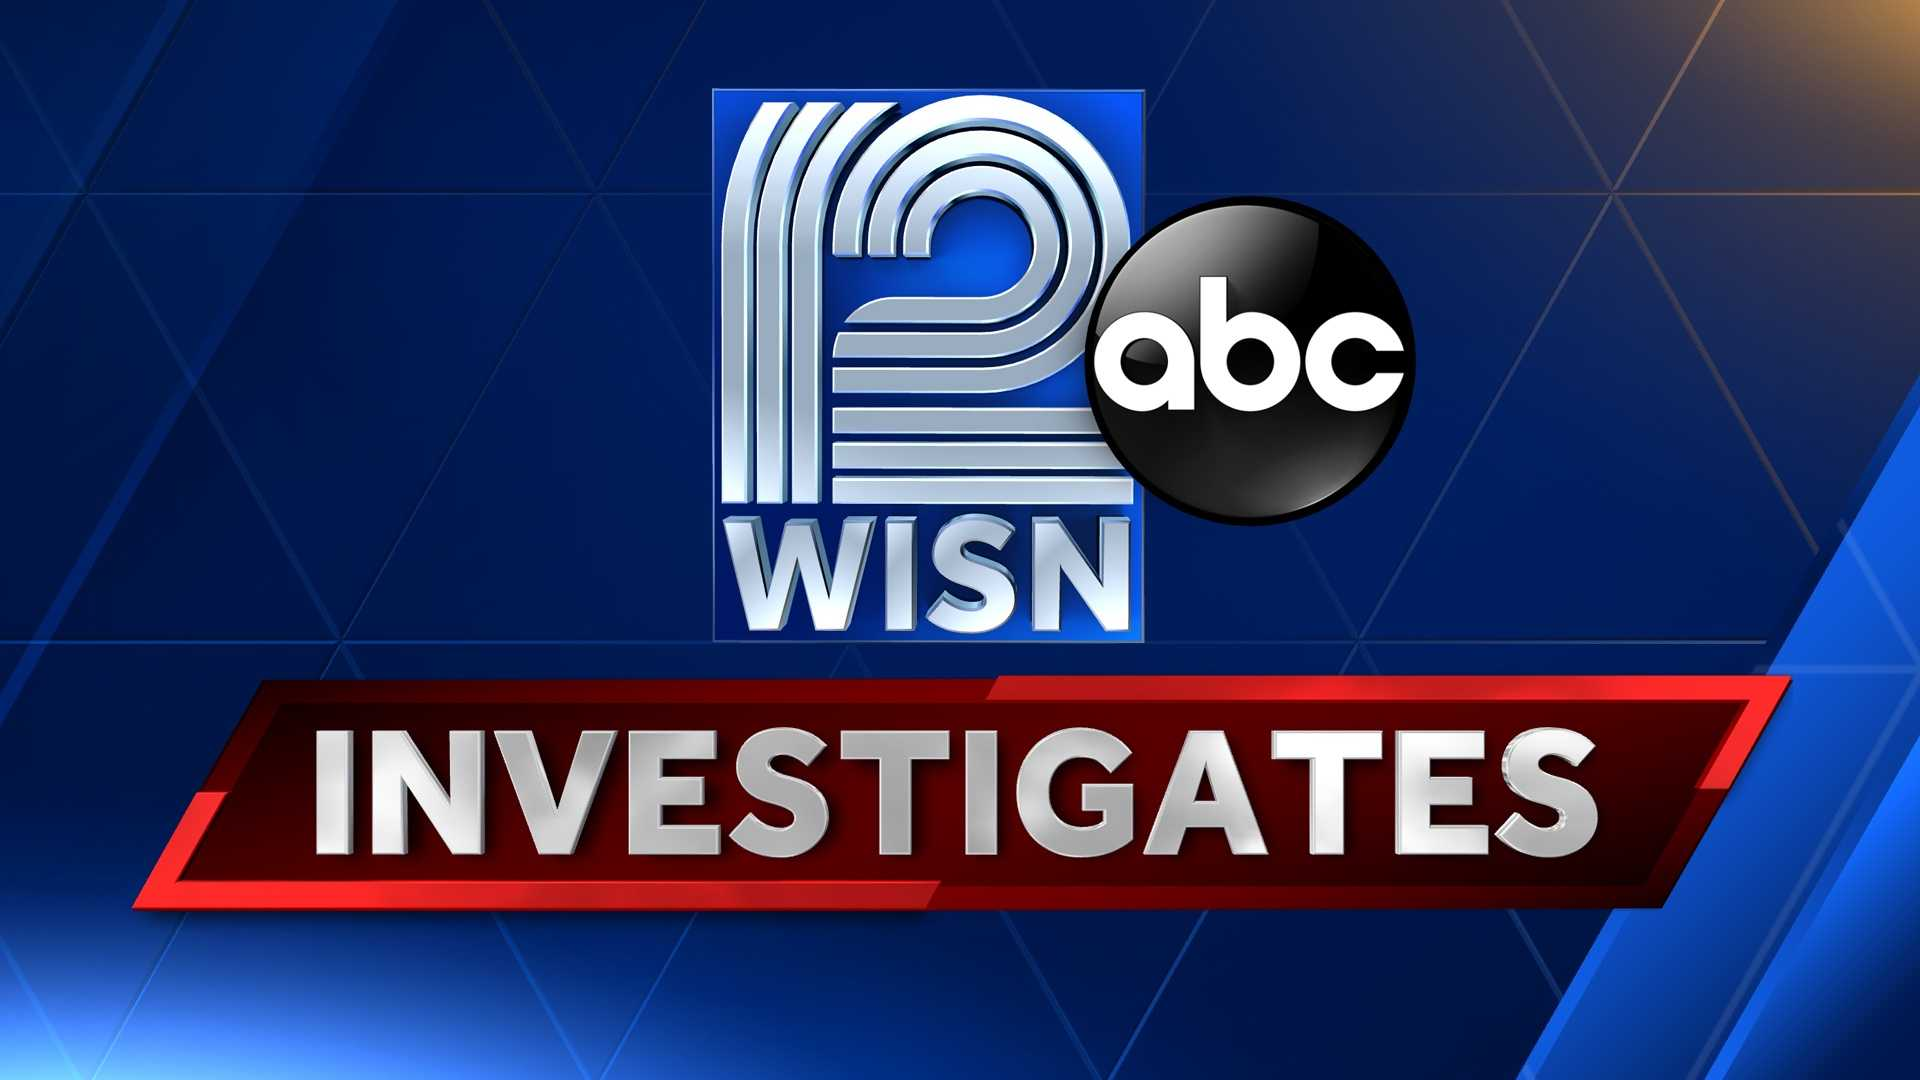 WISN 12 News Investigates